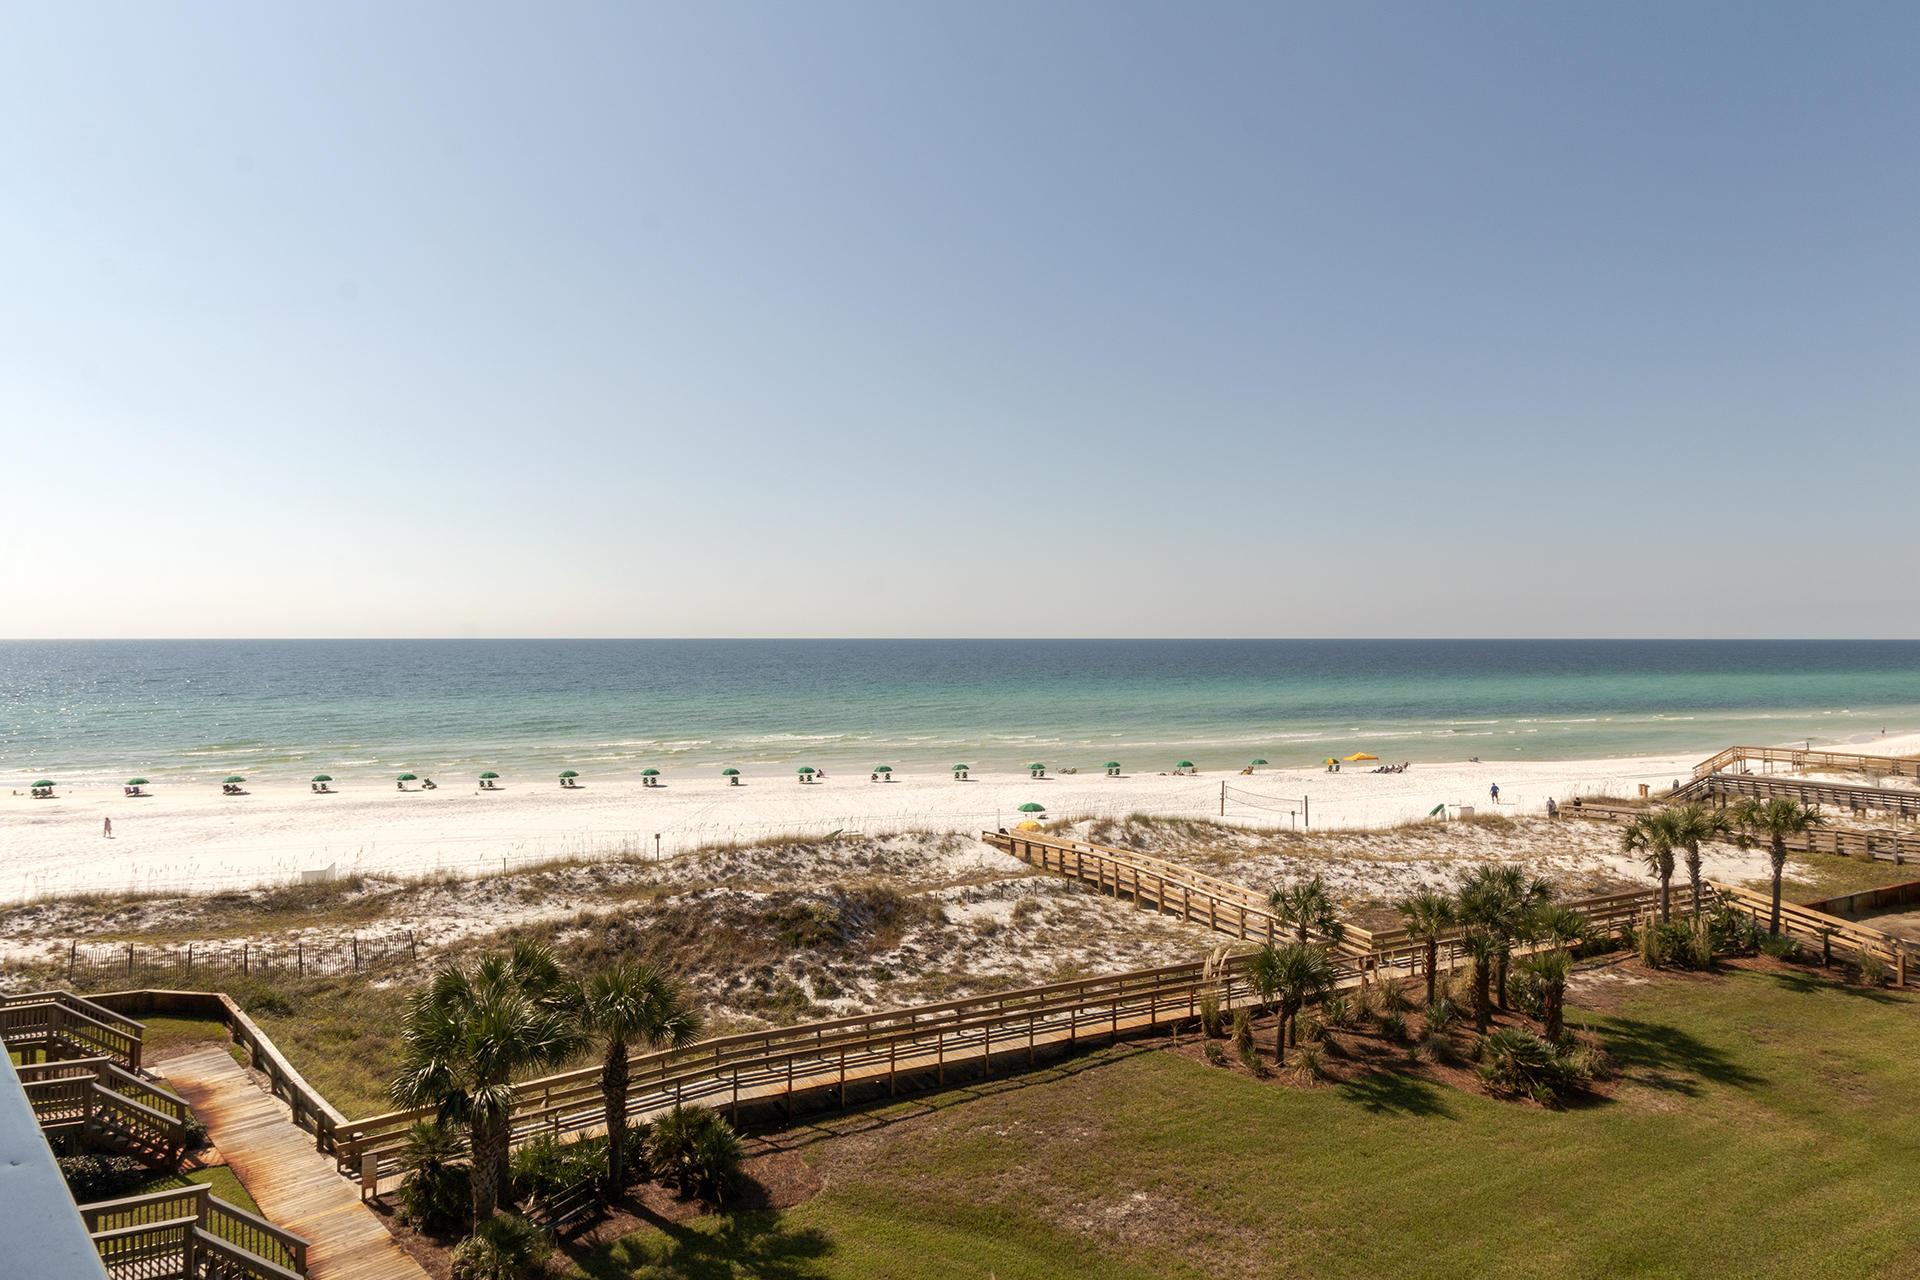 Miramar Beach Real Estate Listing, featured MLS property E810113